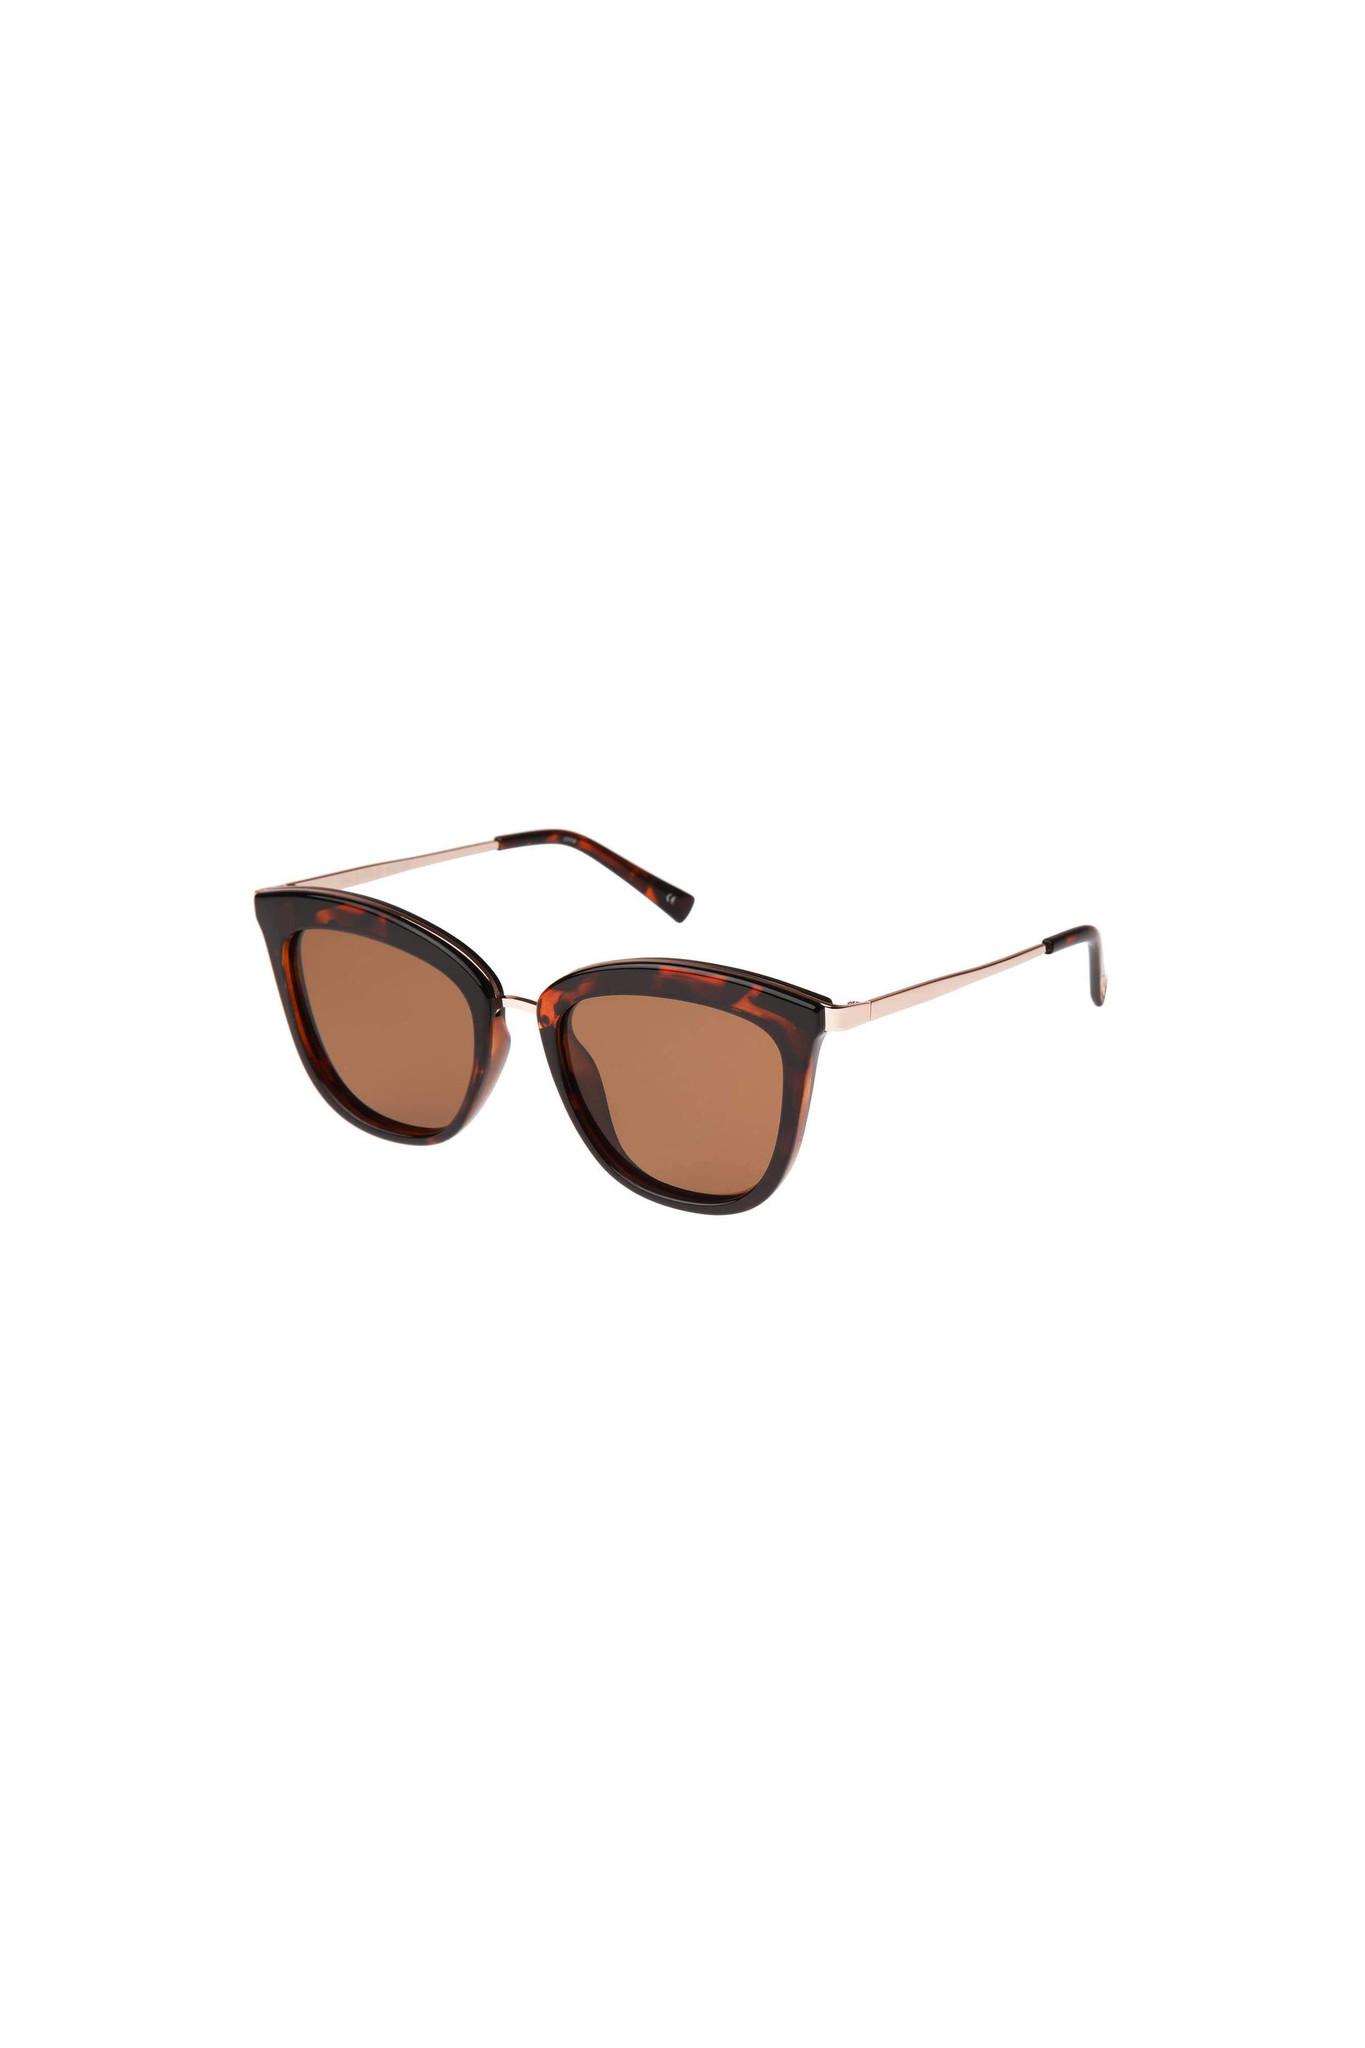 Caliente *Polarized* Sunglasses - Tortoise-2